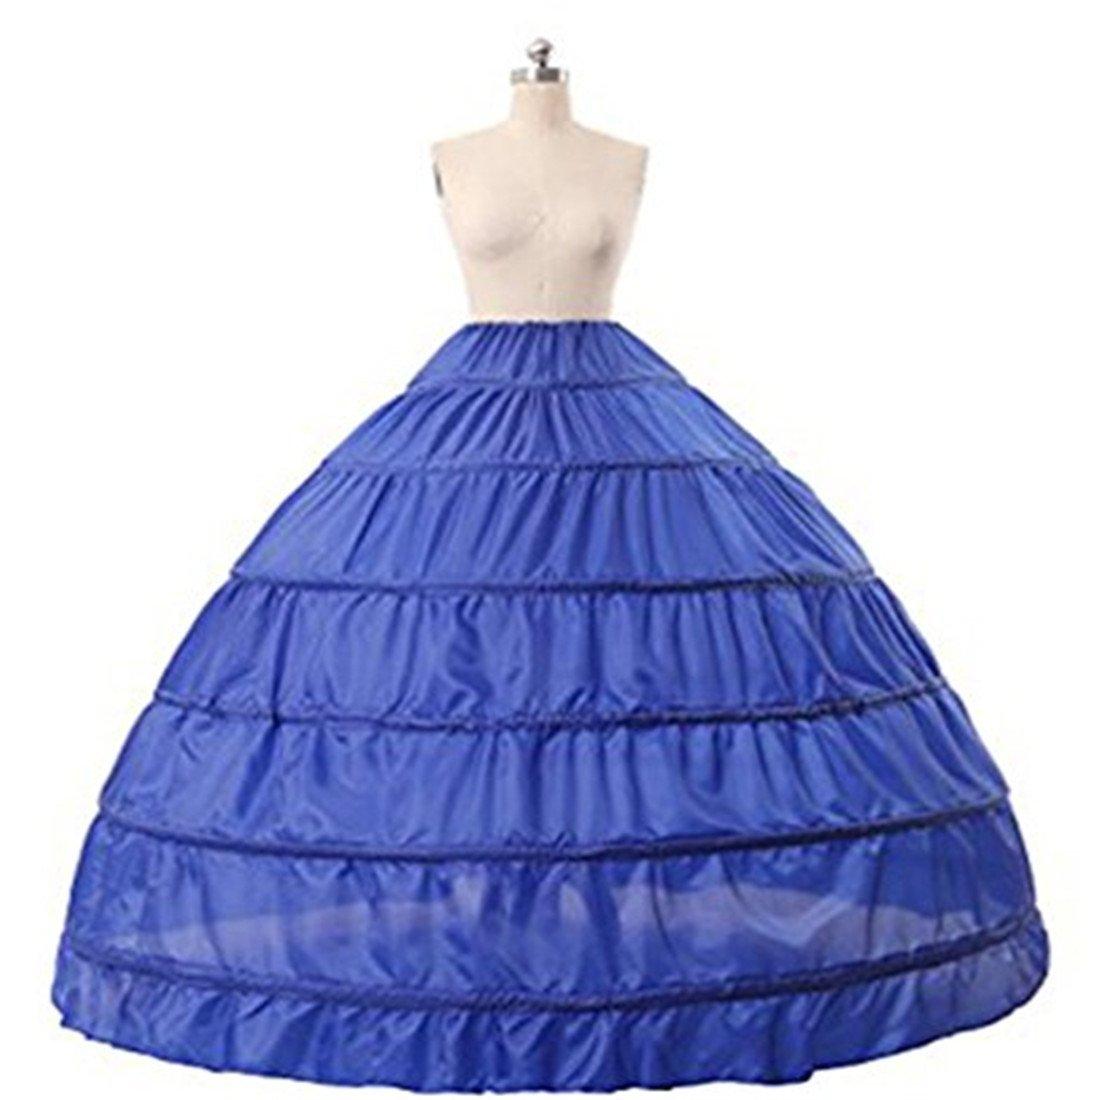 Gurnall Women's Wedding Ruffles Gown Bridal Crinoline Petticoat Hoop Skirt Underskirt 4 Hoops) CQ-4-6-927